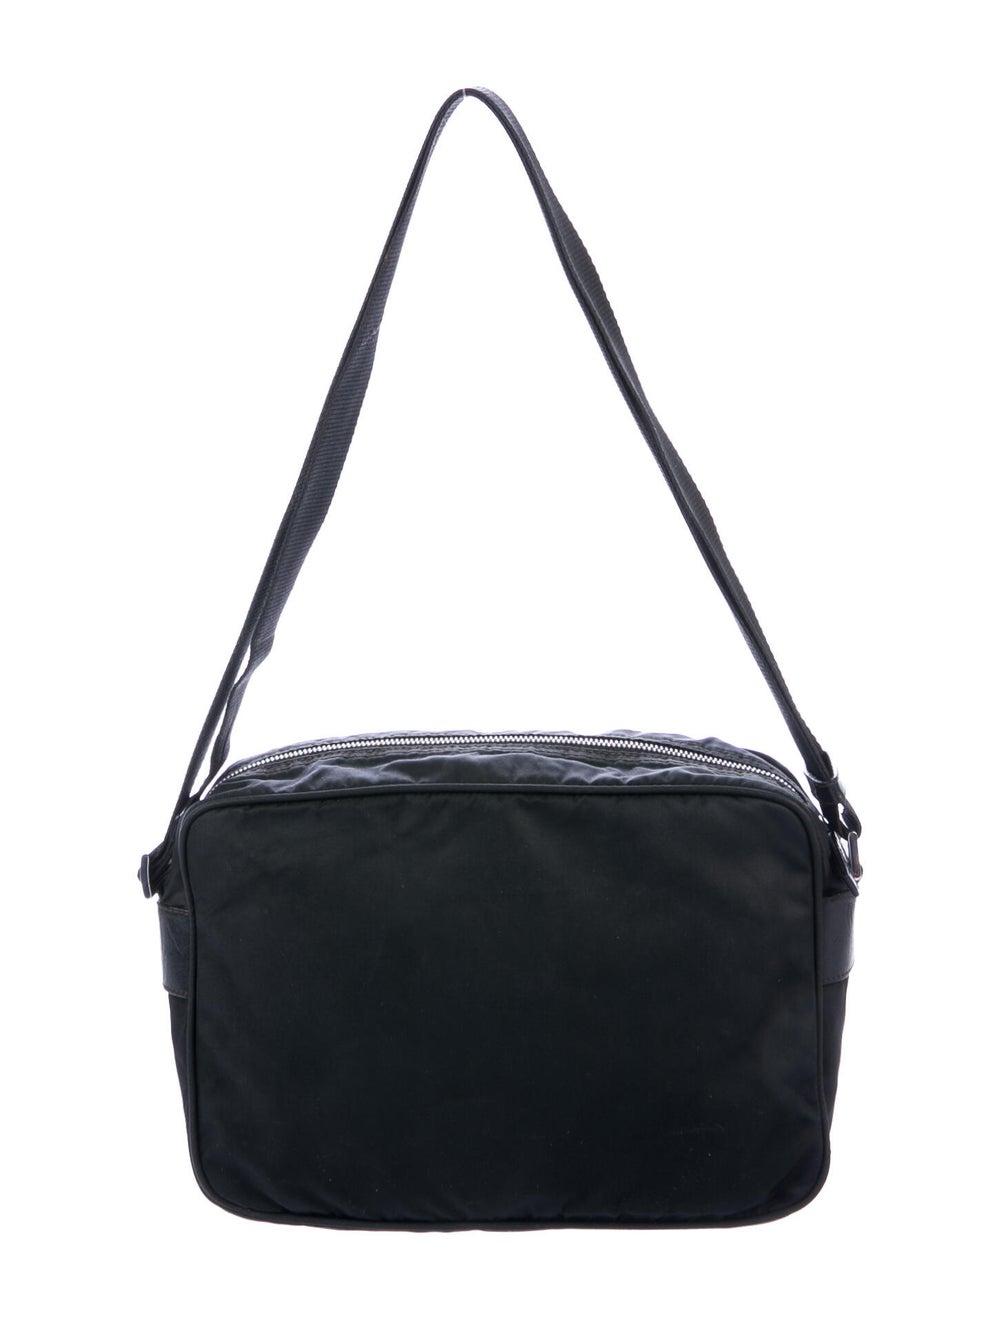 Prada Tessuto Crossbody Bag Black - image 4